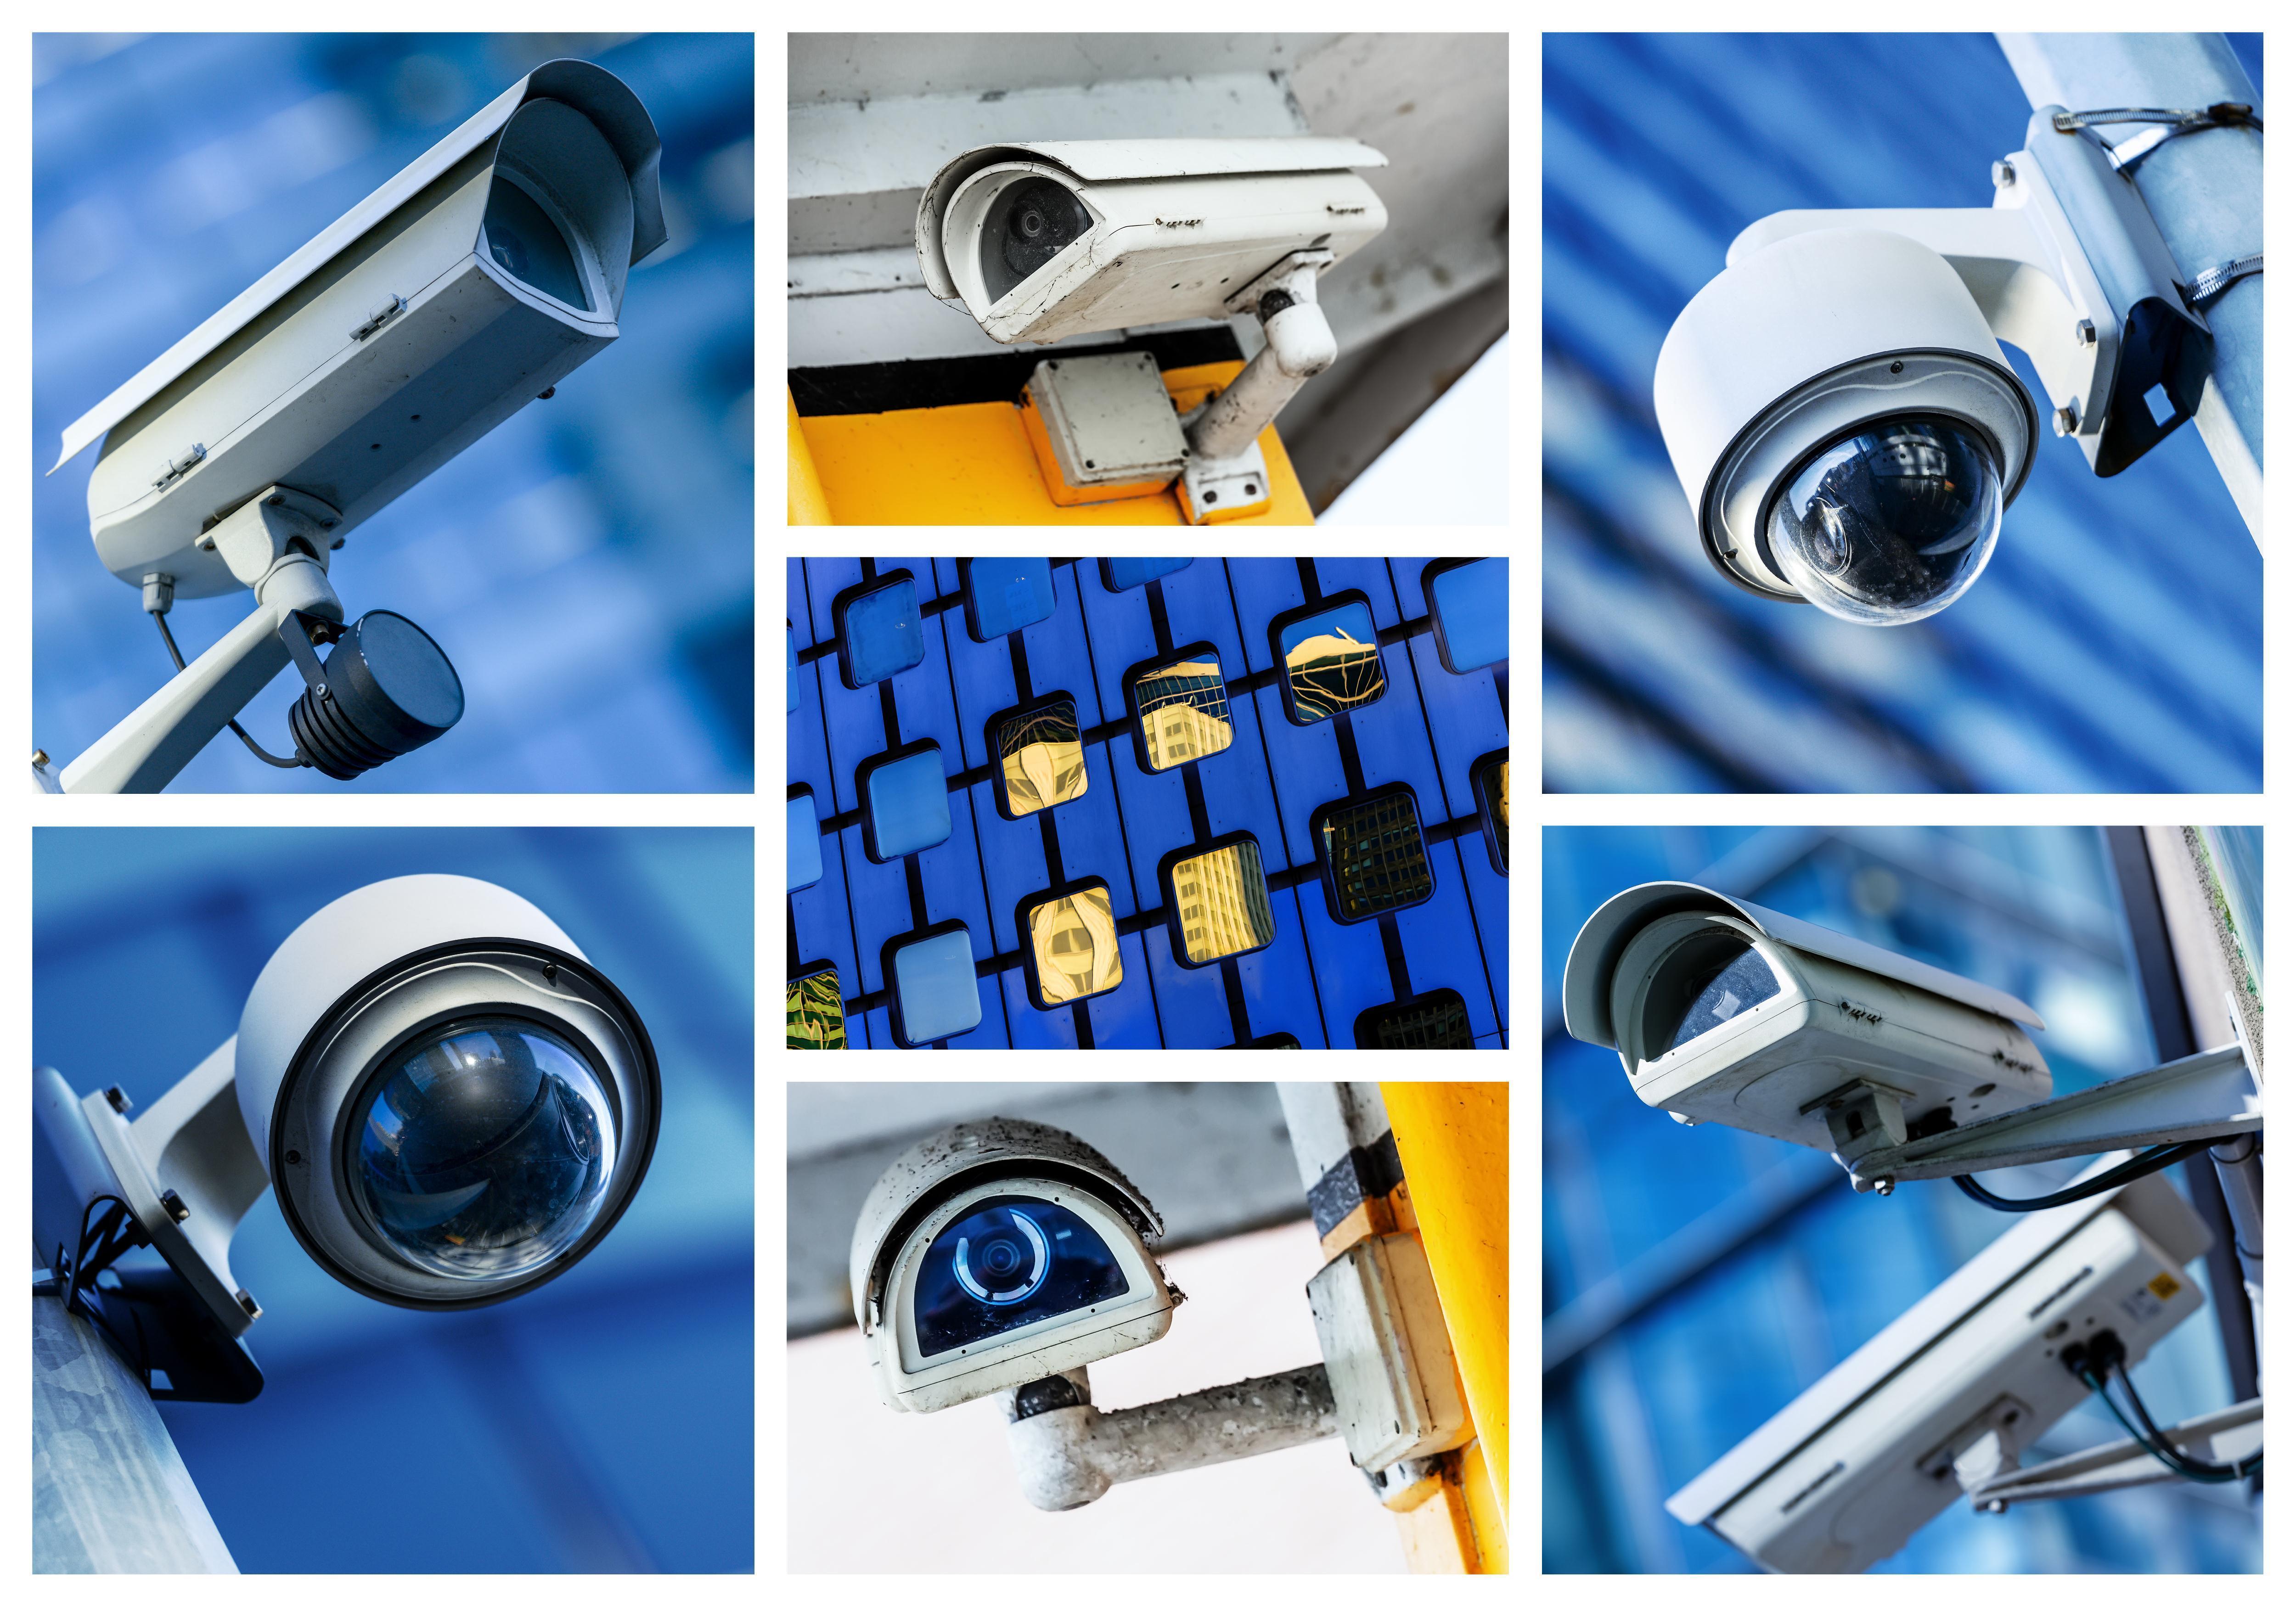 multiple outdoor security cameras